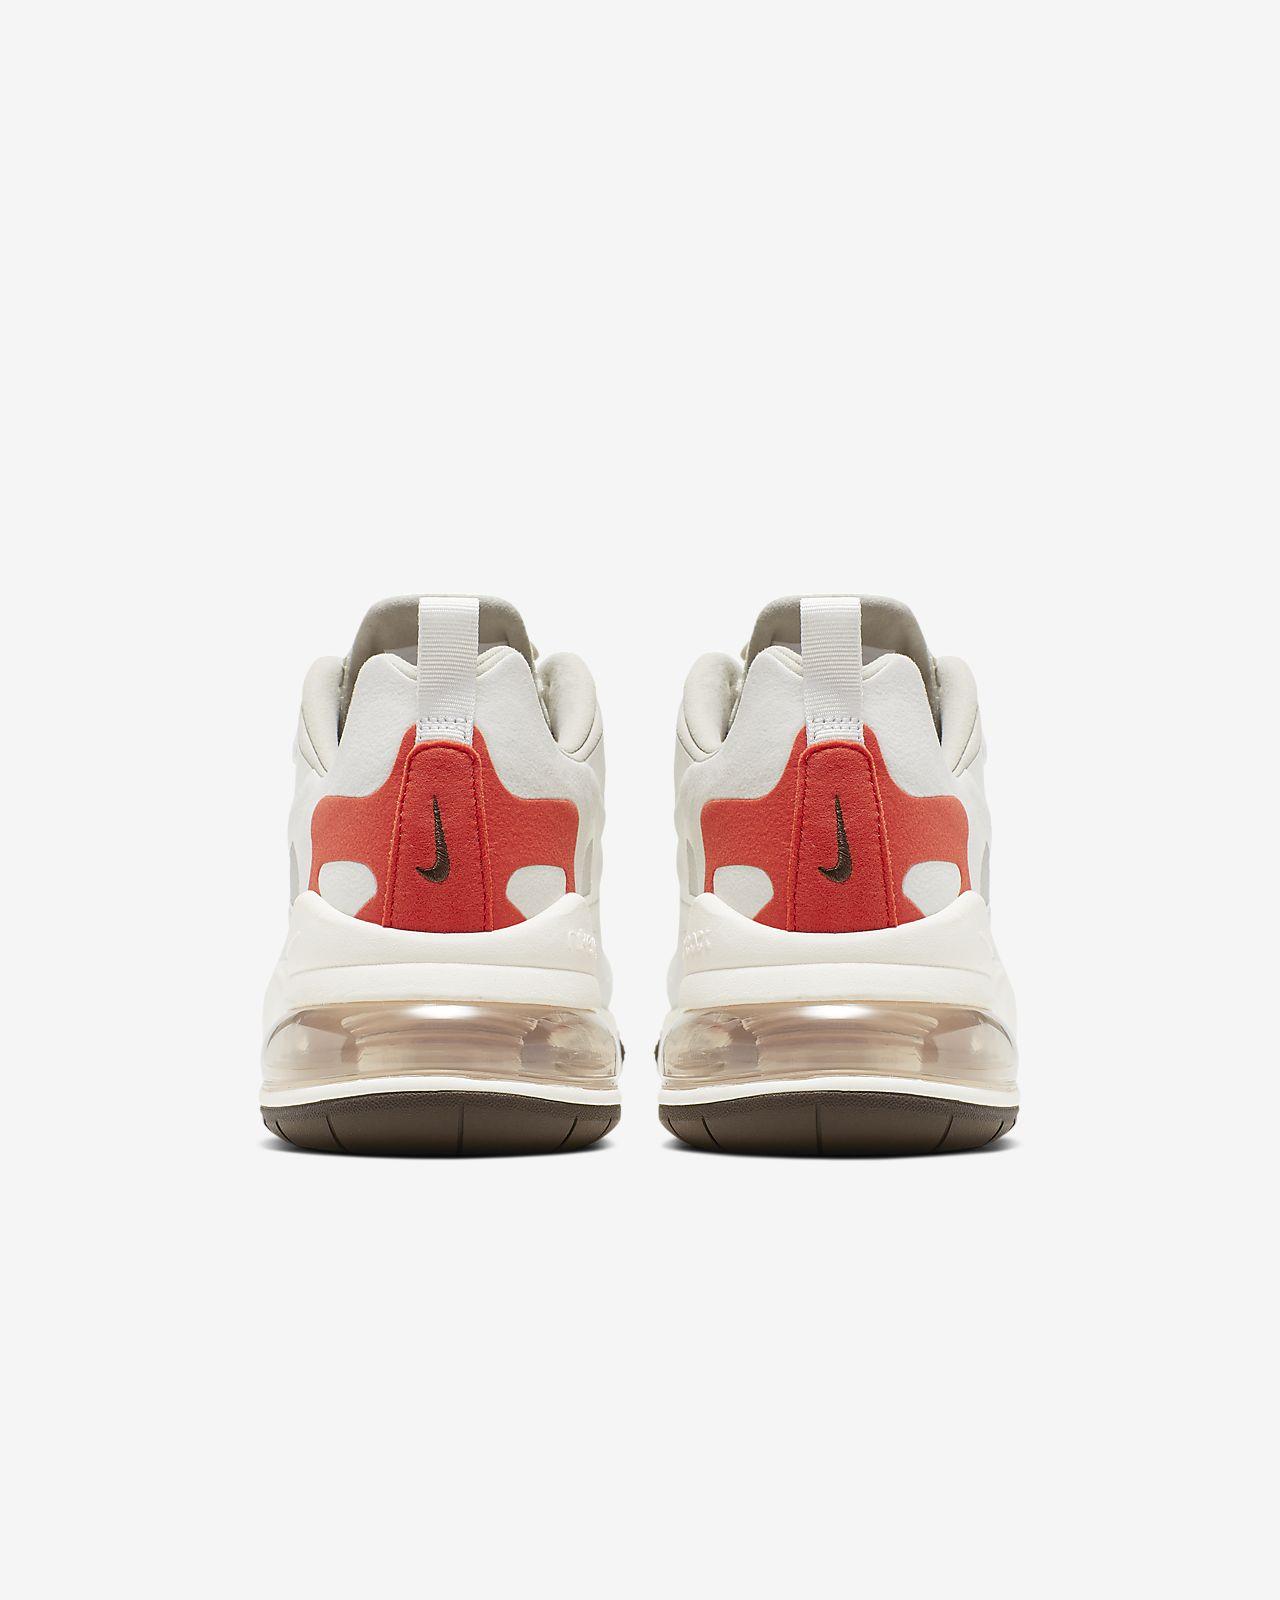 Vari Colori Promo Nike Air Max Nike 270 Scarpe Da Uomini